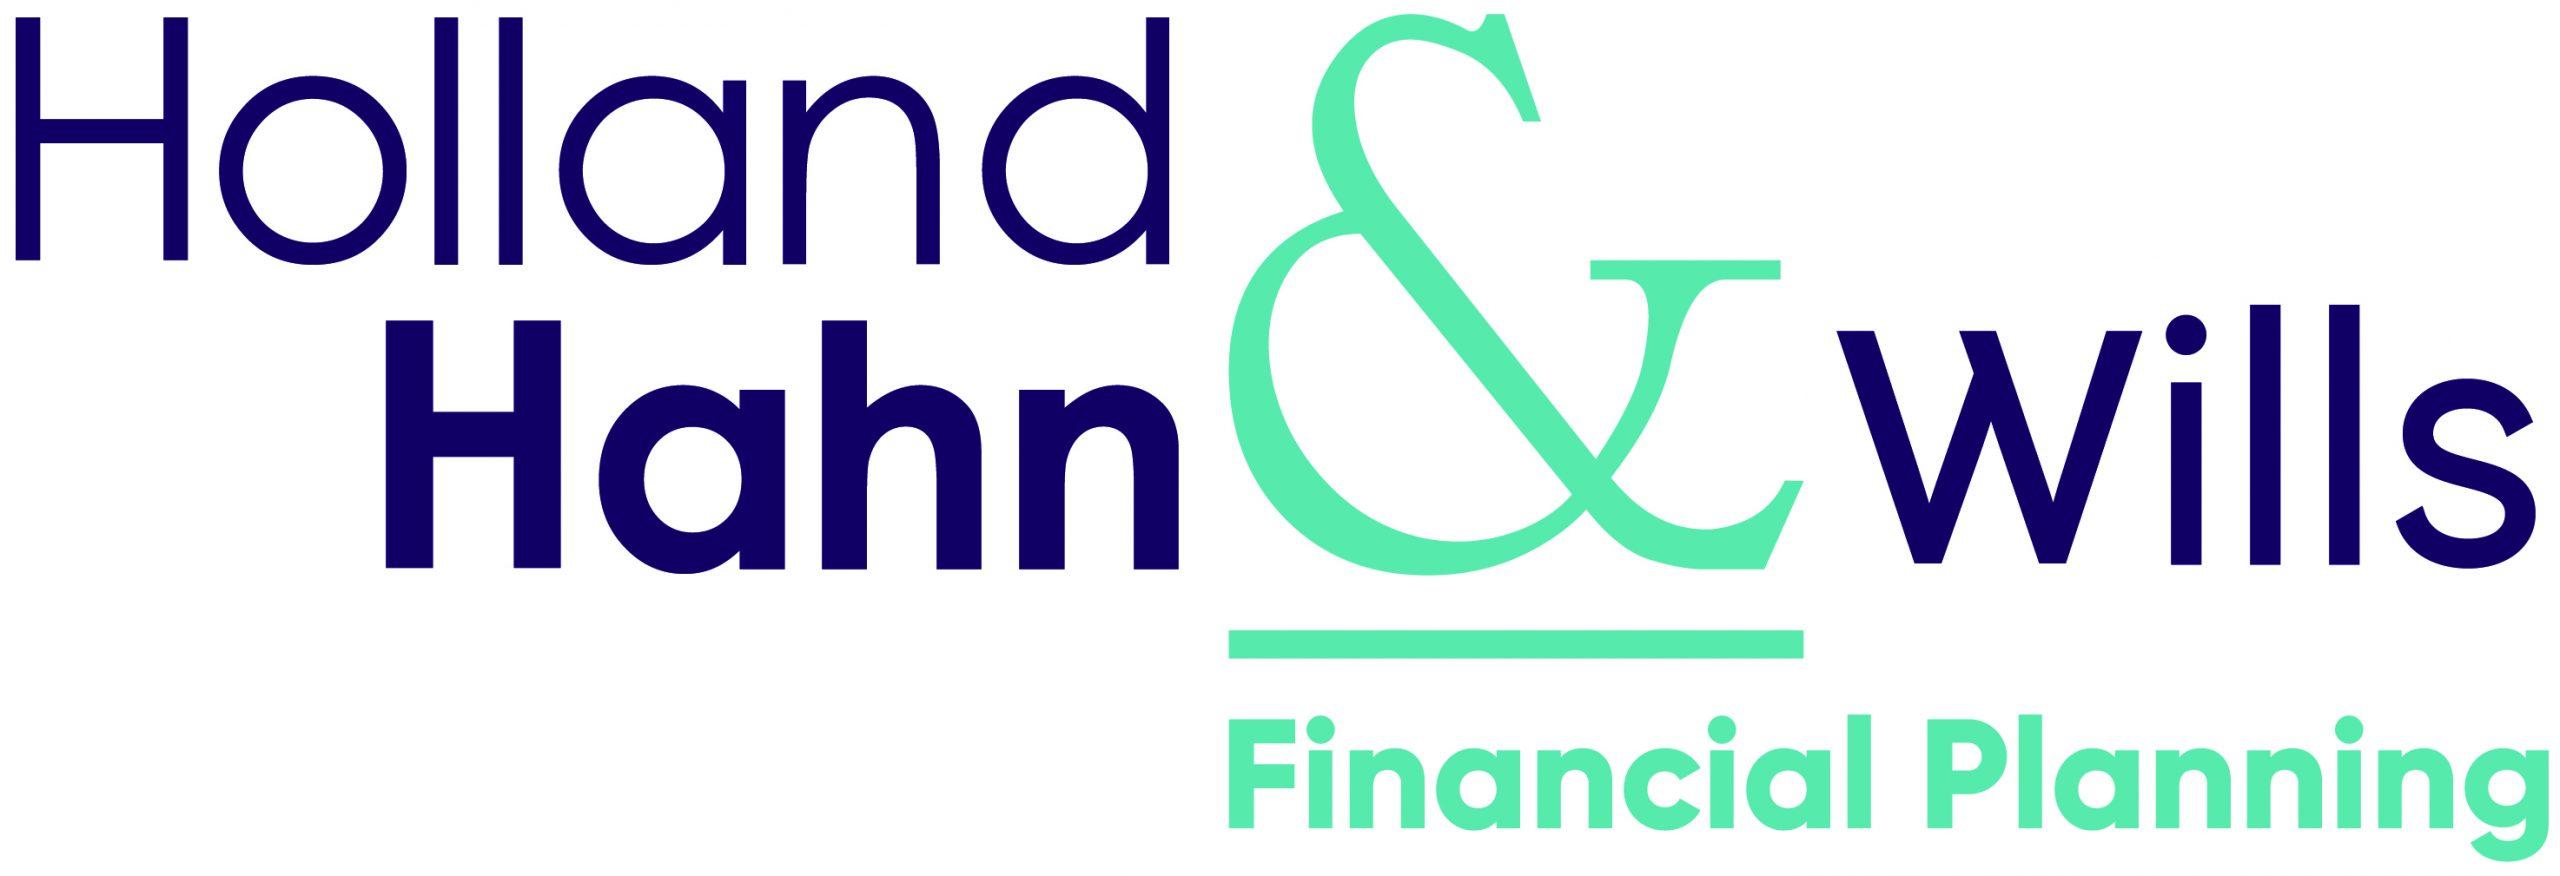 Holland Hahn & Wills Financial Planning